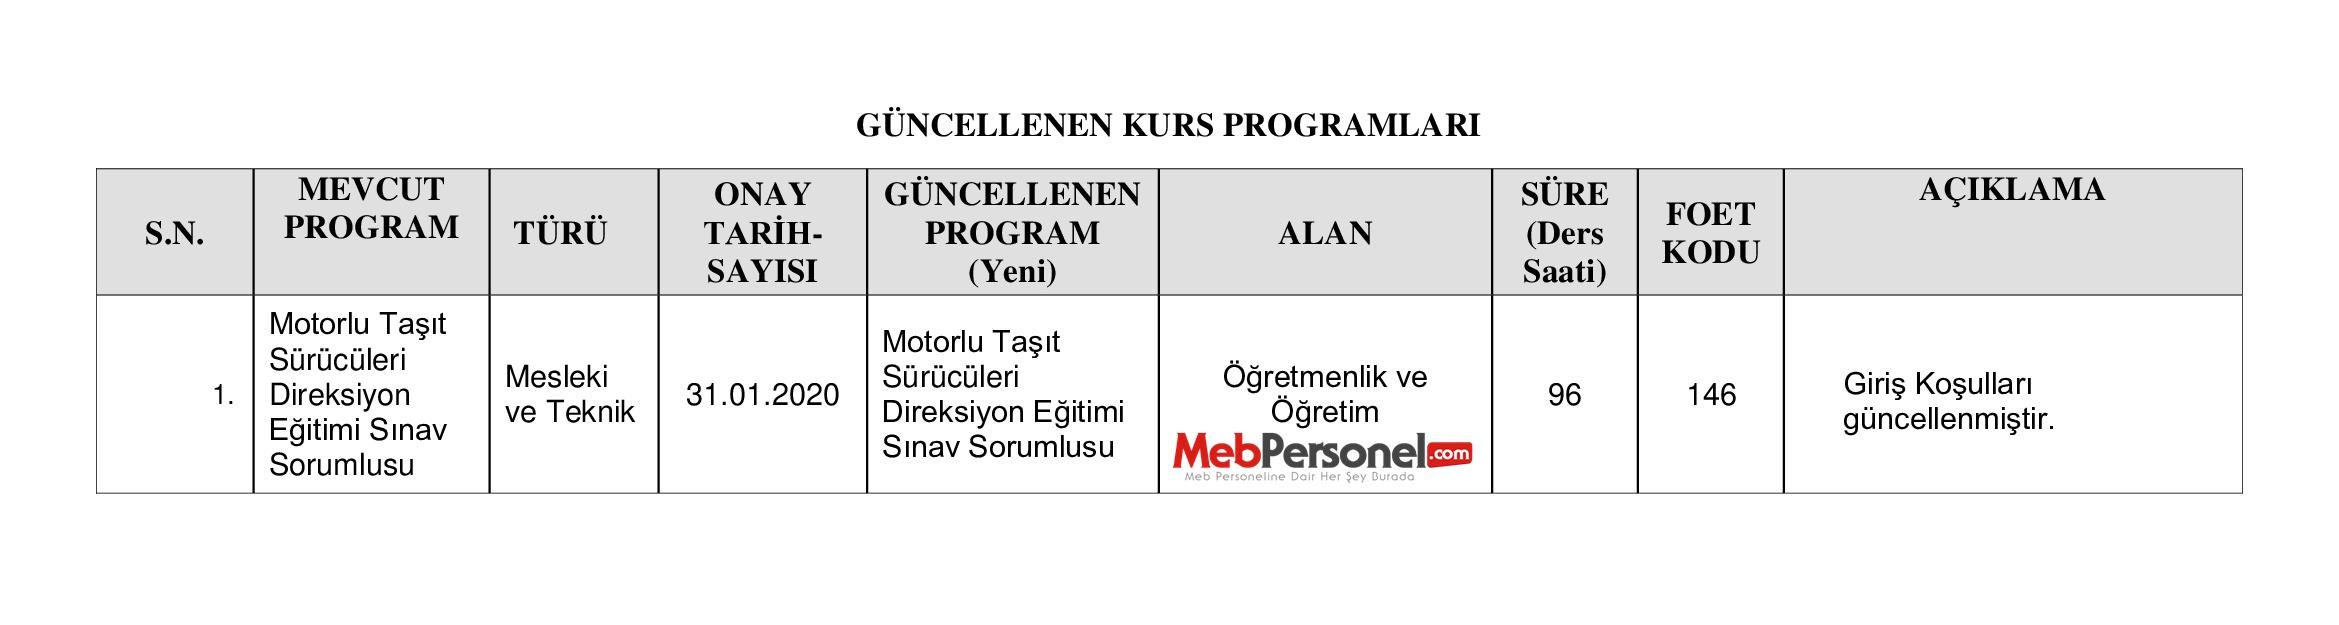 ek2-guncellenen-kurs-programi-listesi-1-001.jpg